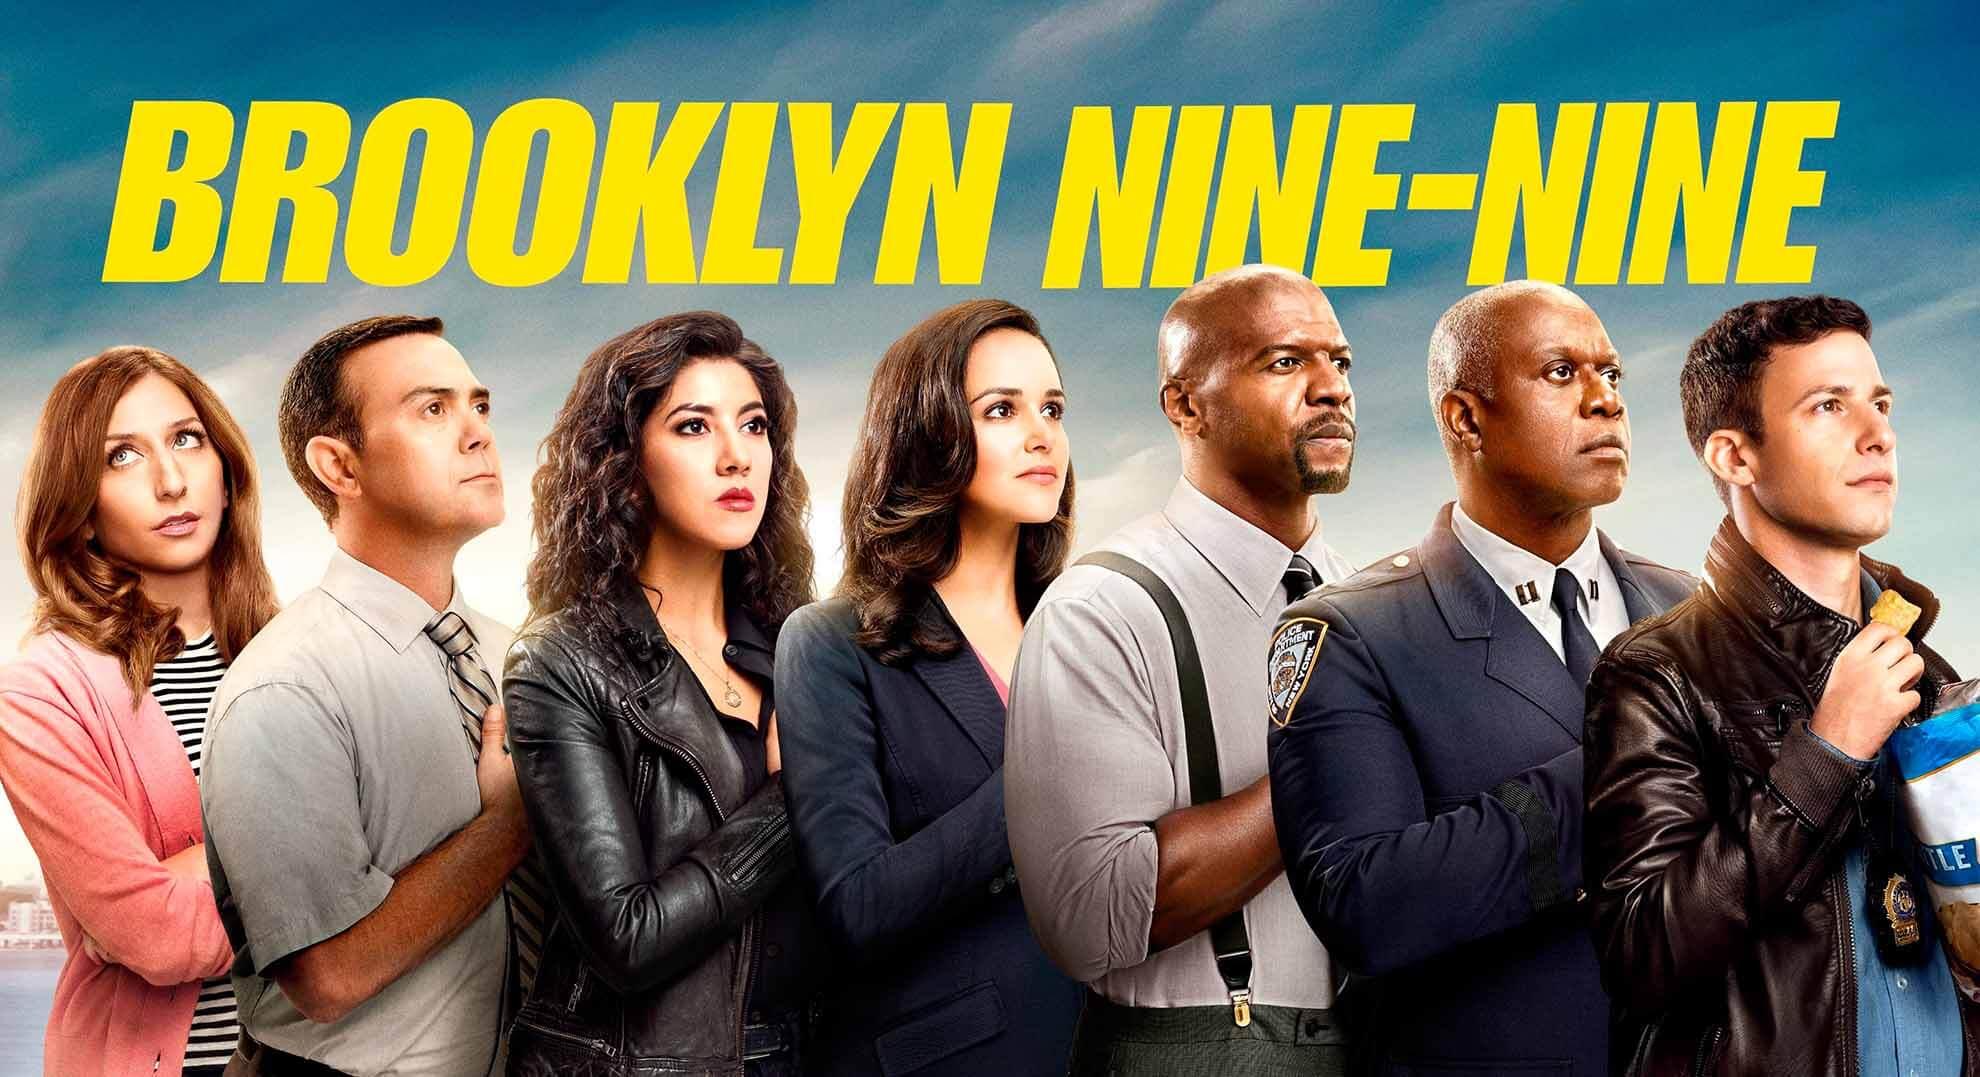 brooklyn nine-nine season 8 cast